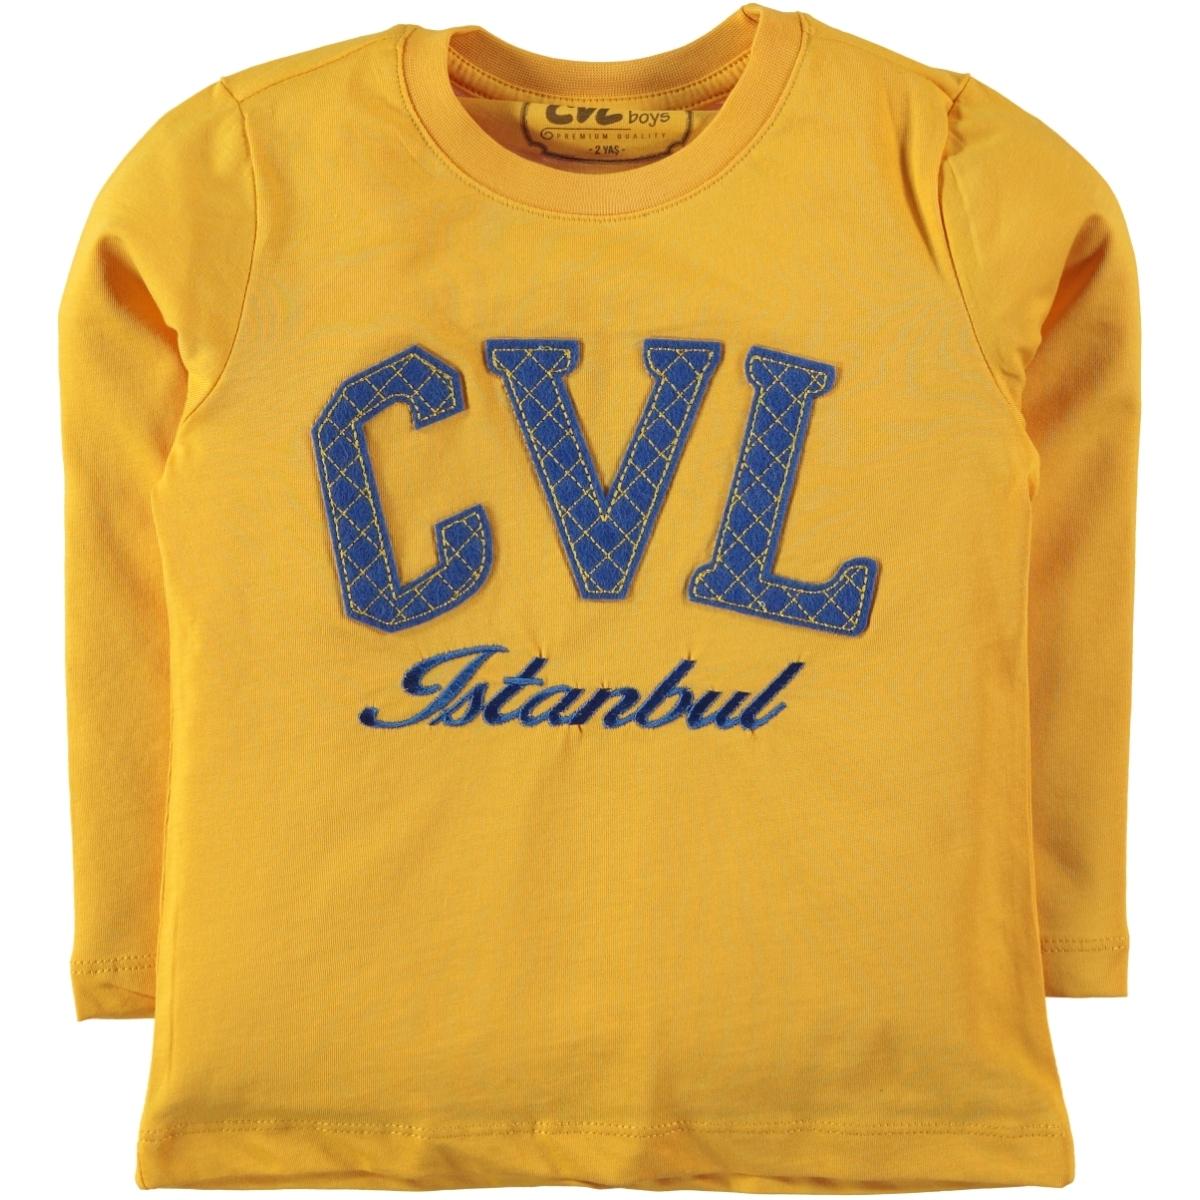 Cvl Mustard Sweatshirt Boy Age 10-13